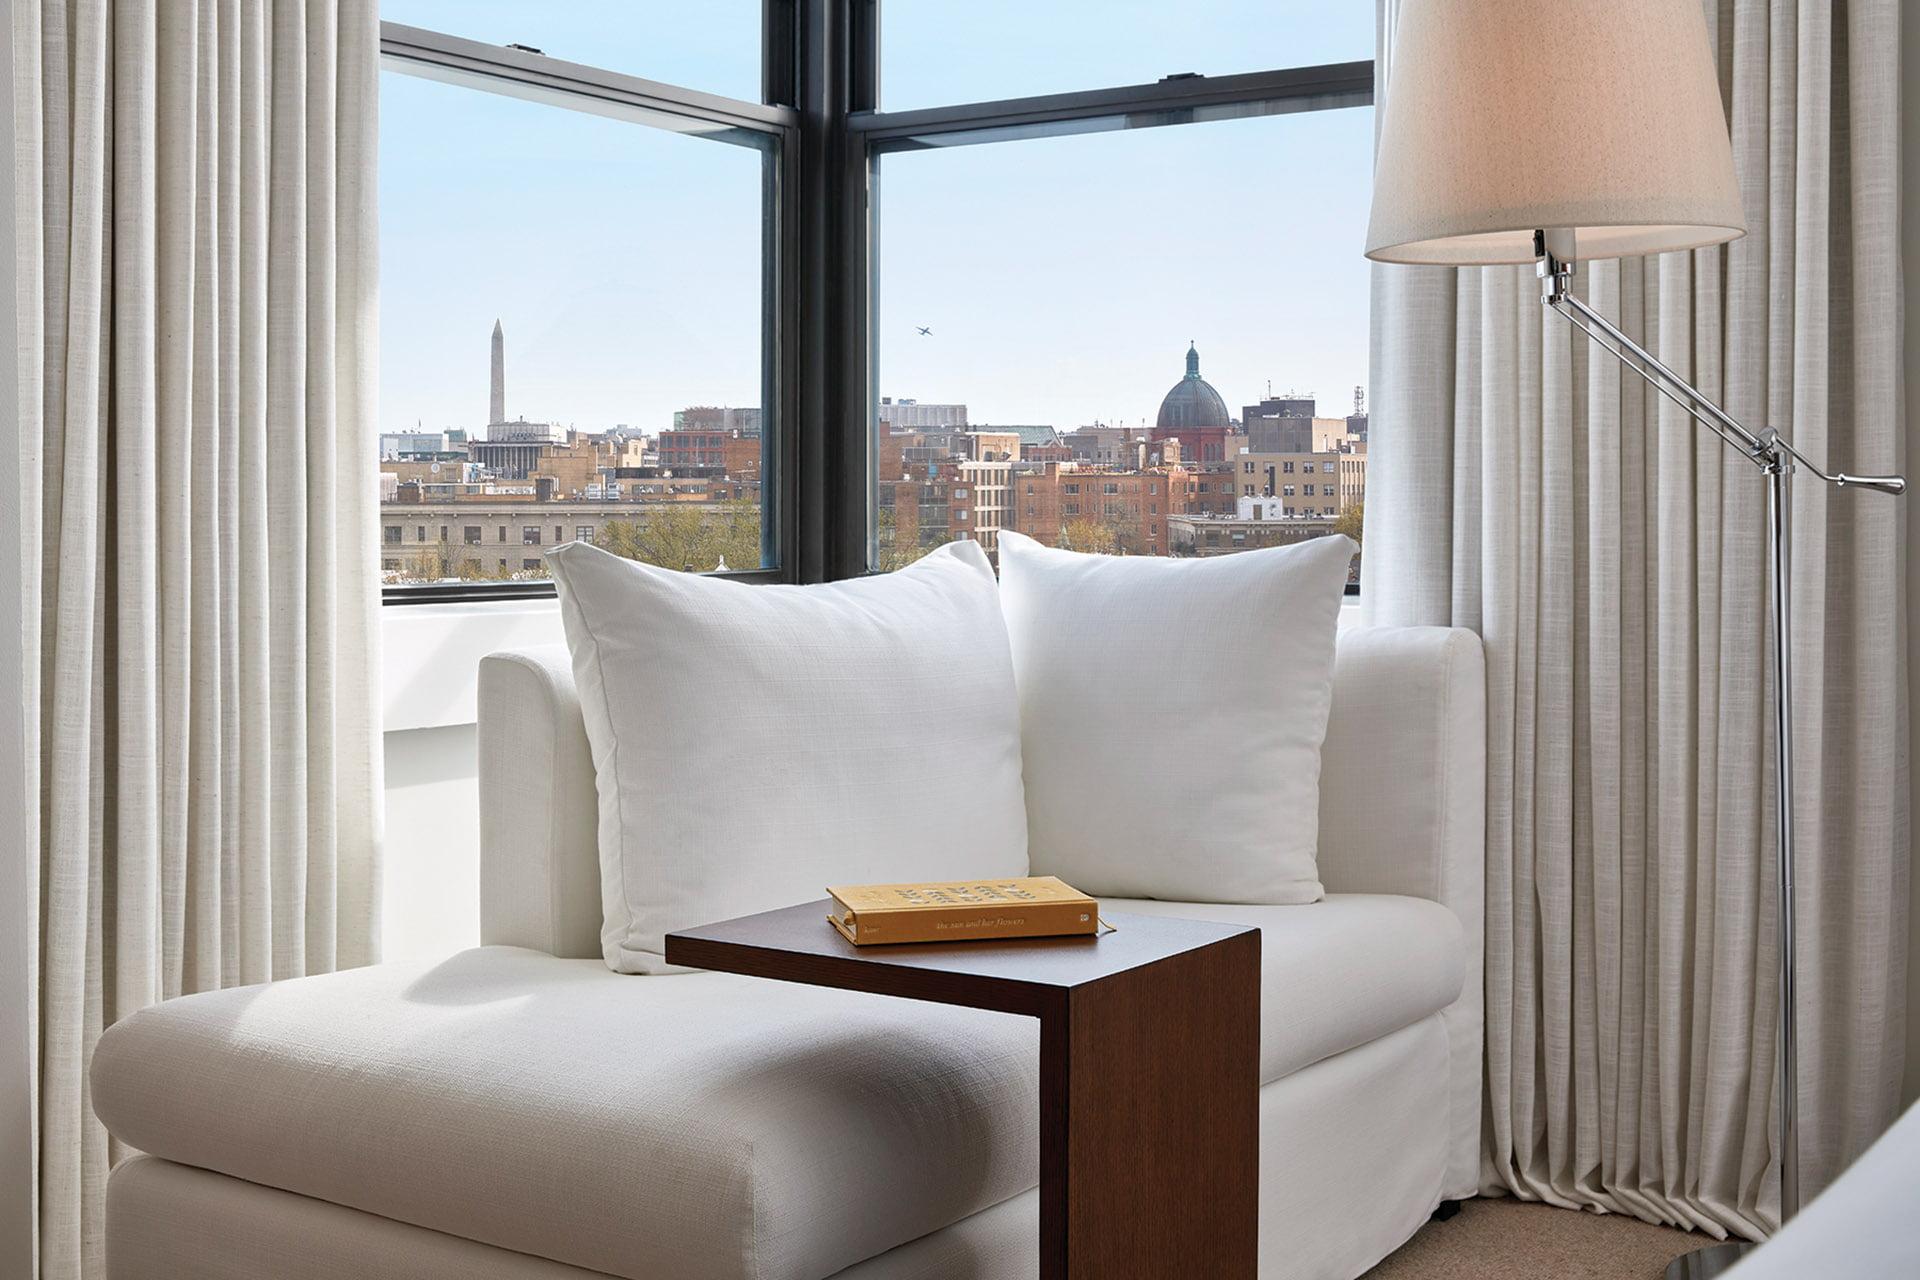 Lyle Hotel room furniture